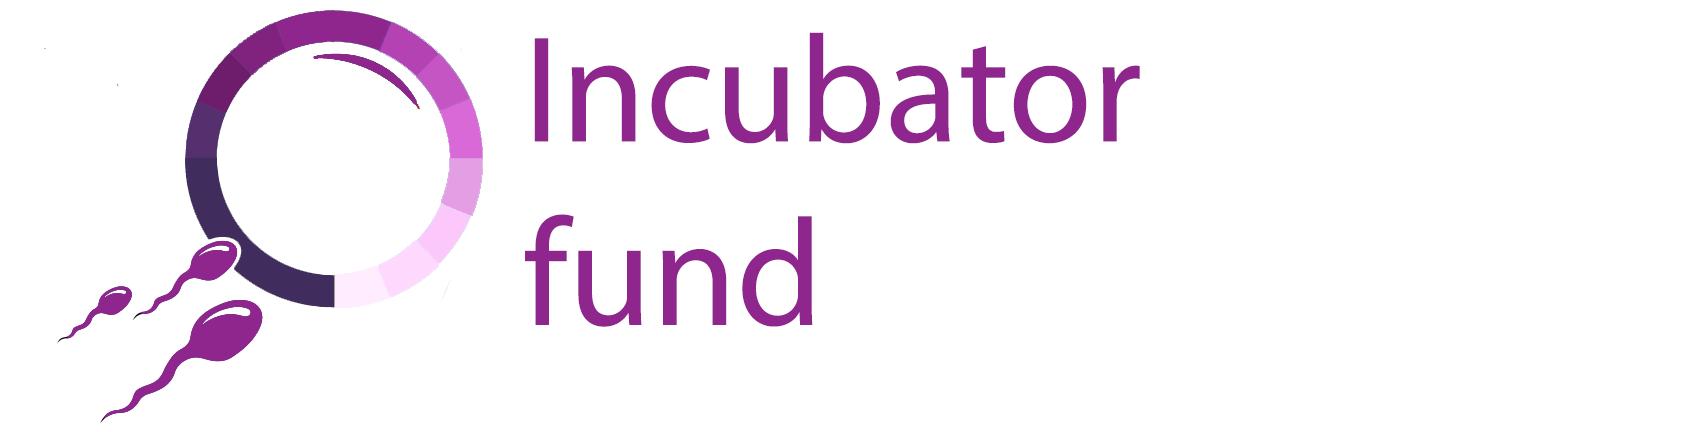 Incubator fund logo